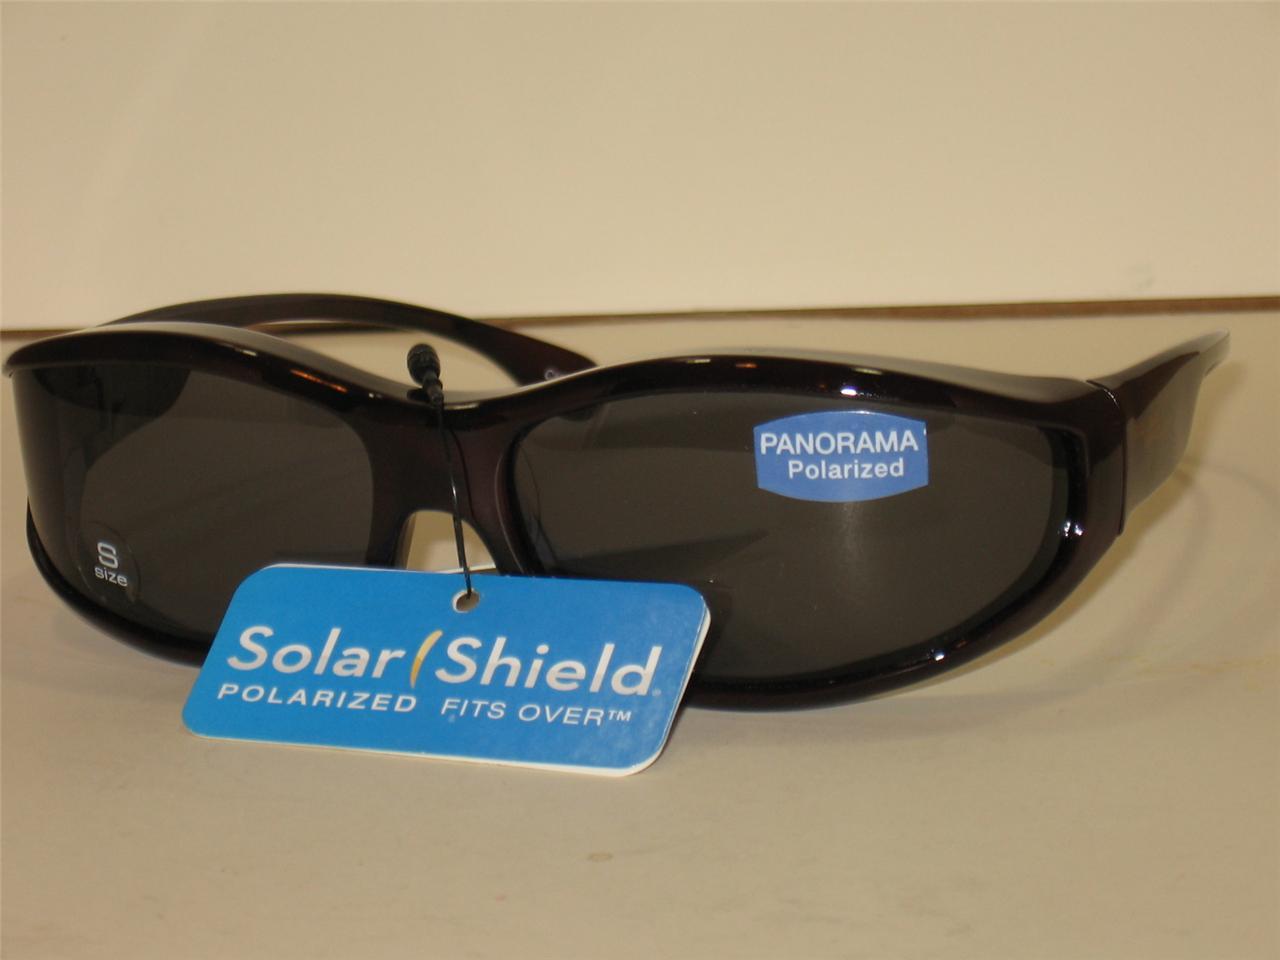 c1ec659f648 Solar Shield Fits Over Polarized Sunglasses